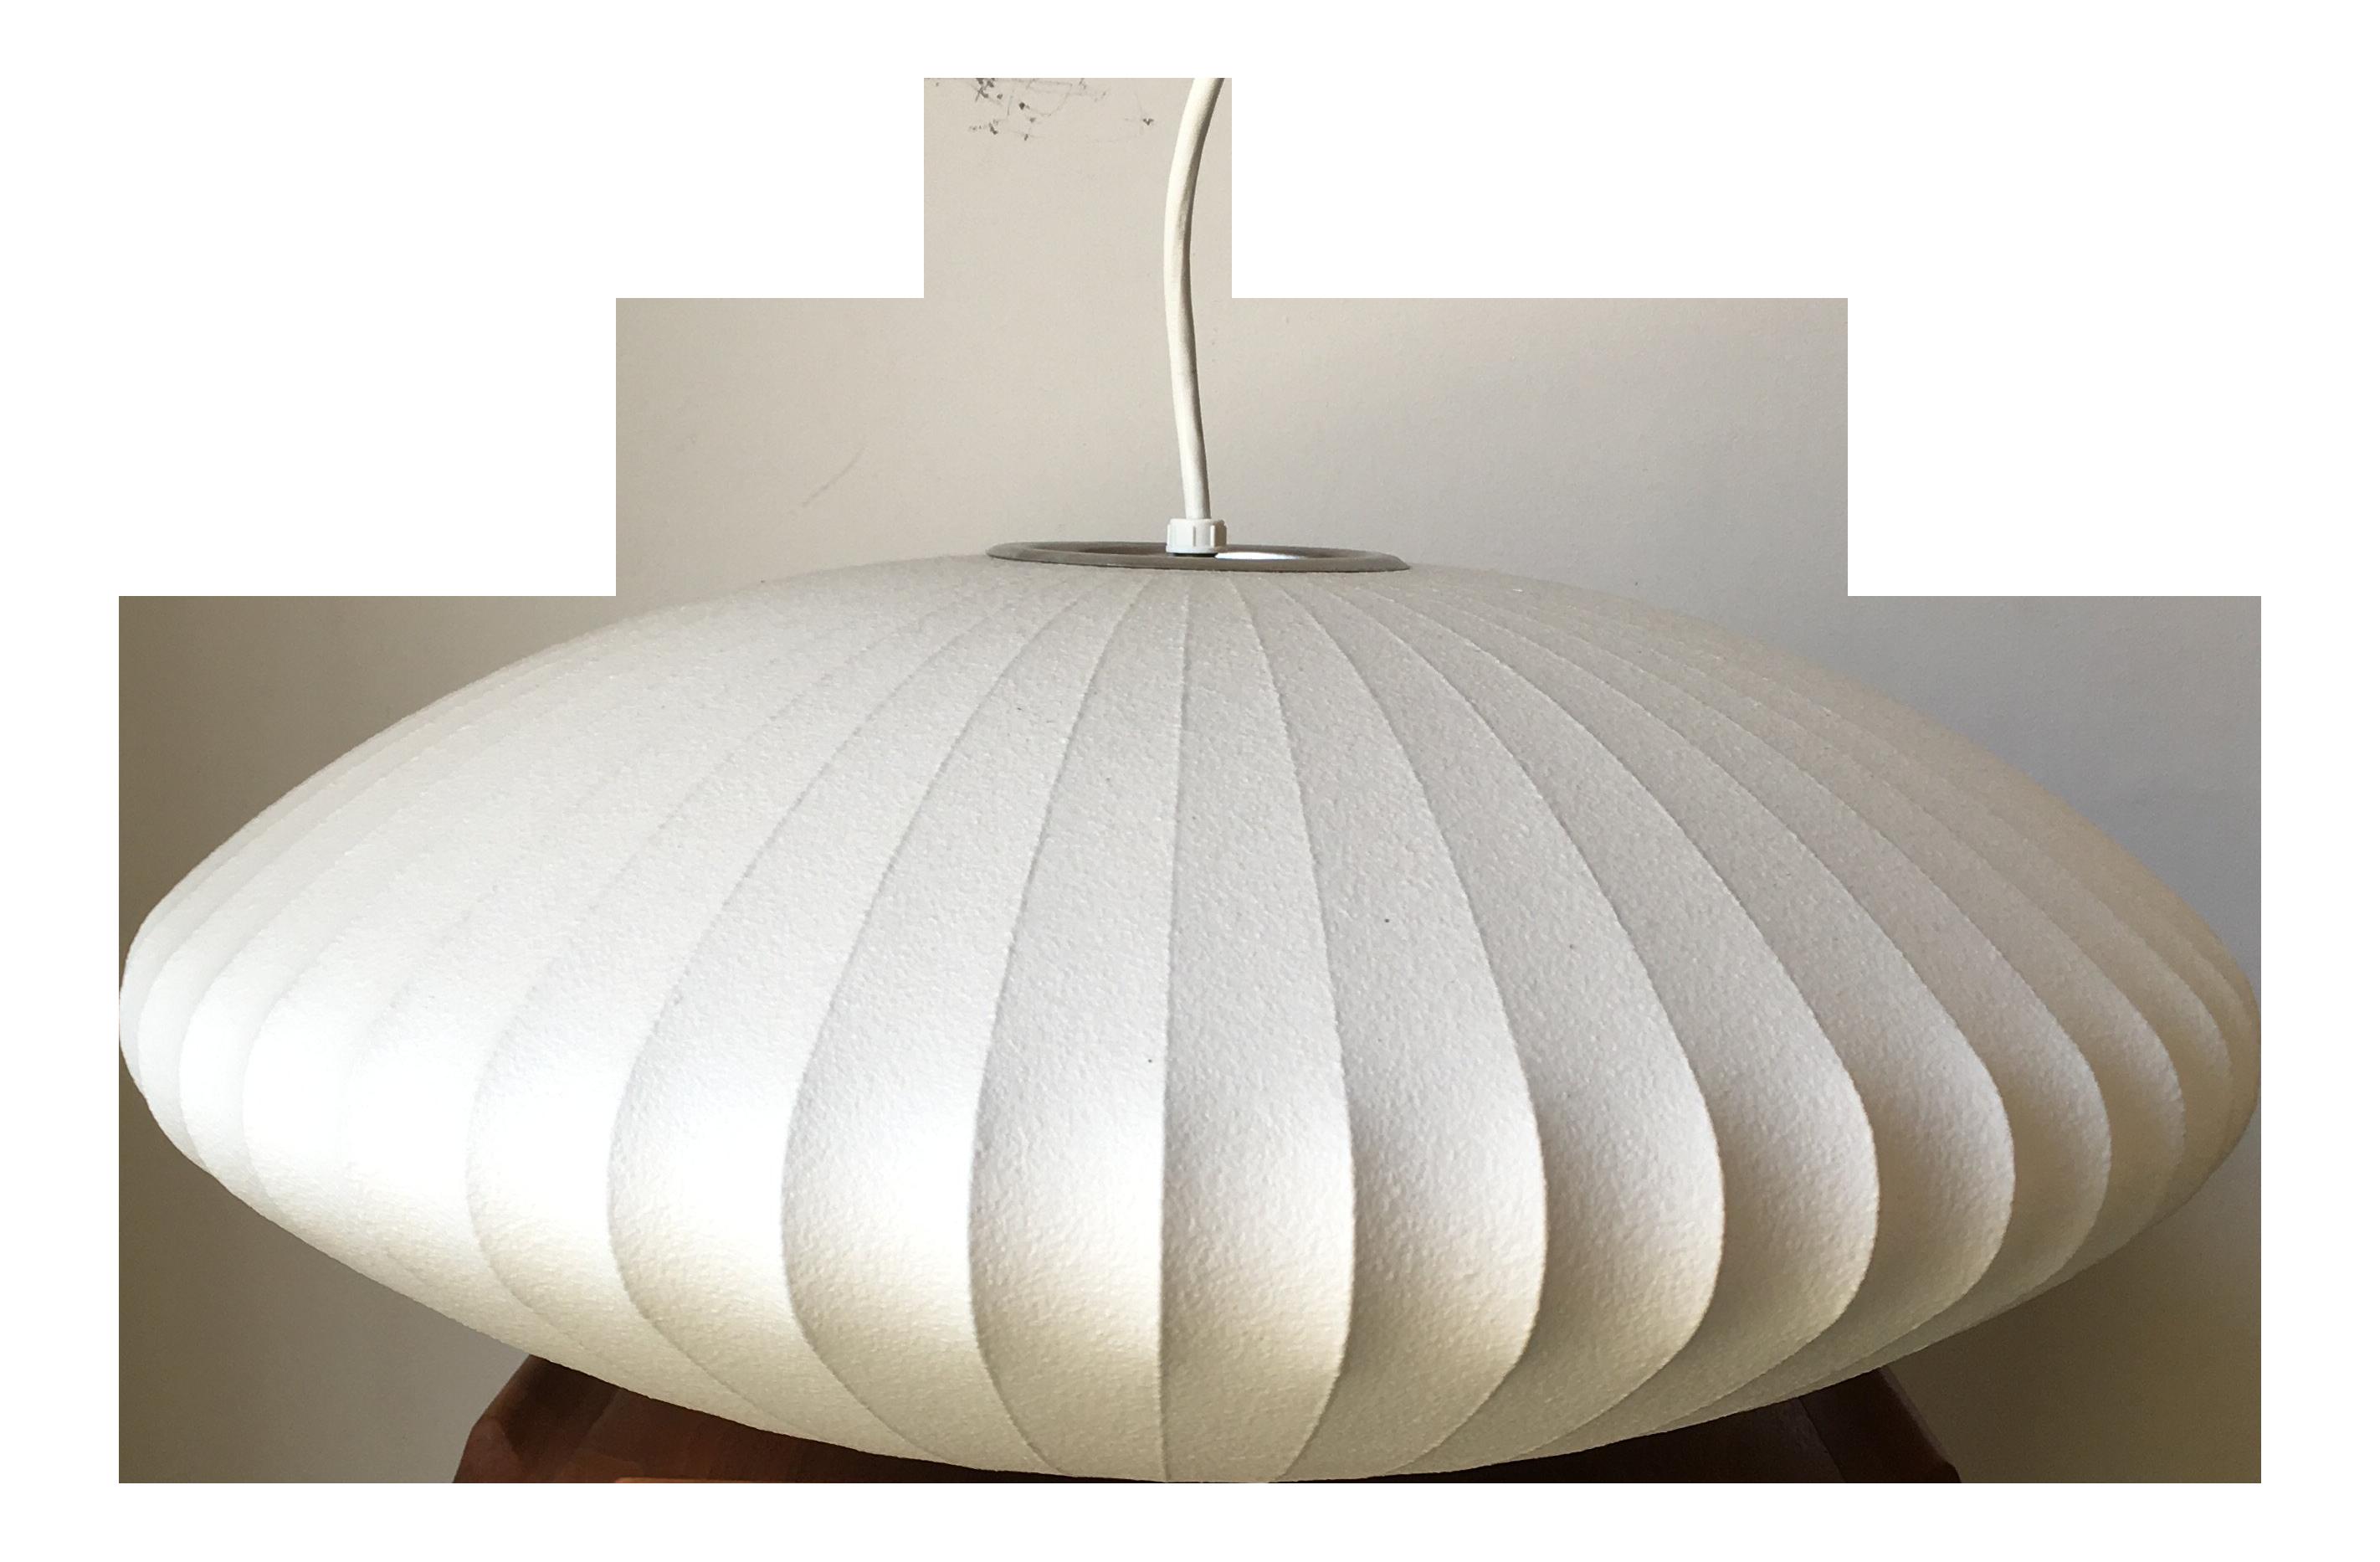 Modernica Production Nelson Bubble Pendant Light Medium Saucer Chairish